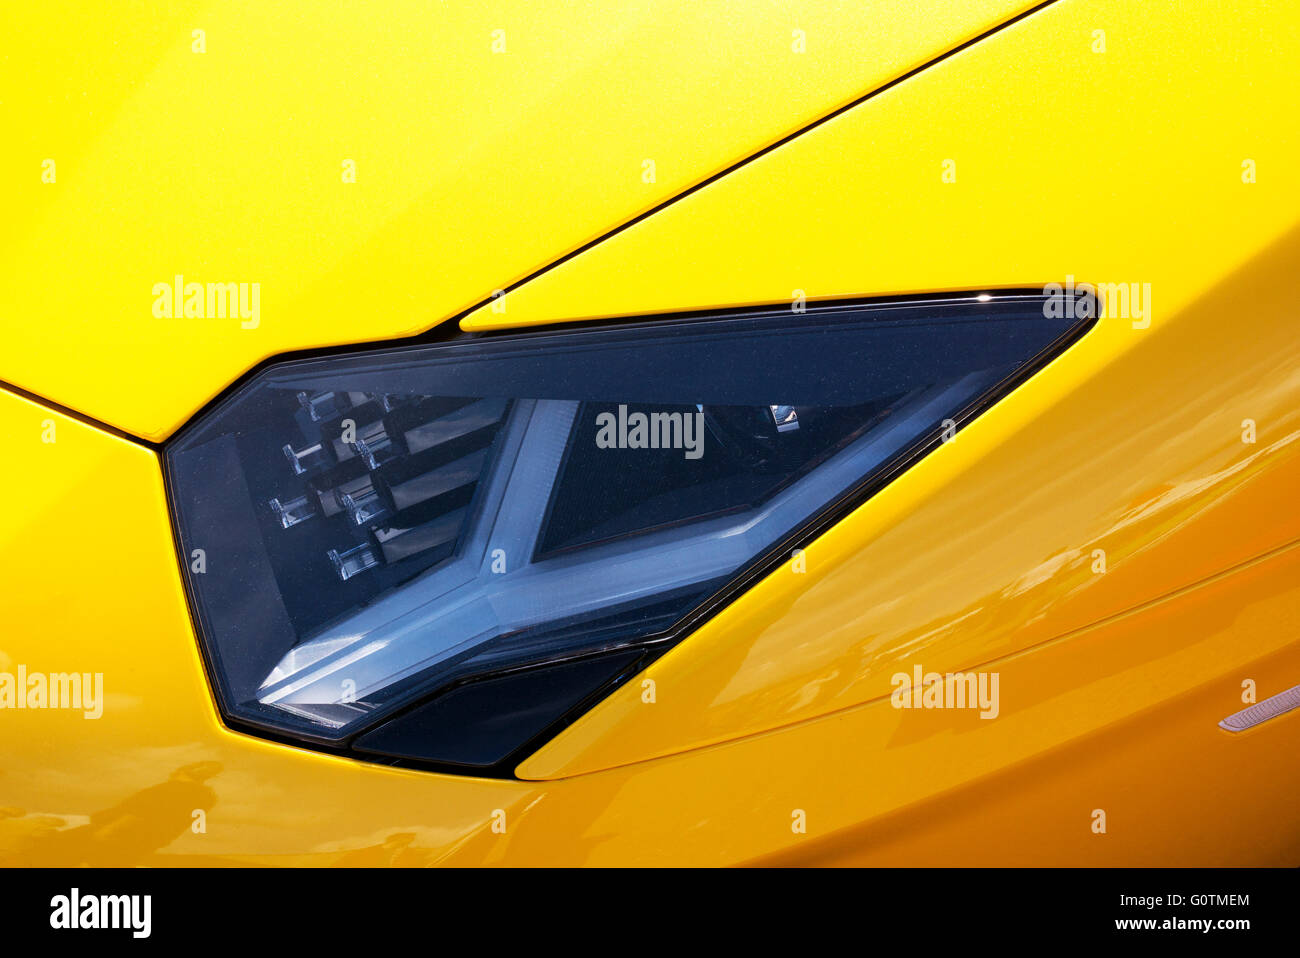 Lamborghini Aventador Roadster Front Headlight Abstract. Italian Super Car Design Ideas